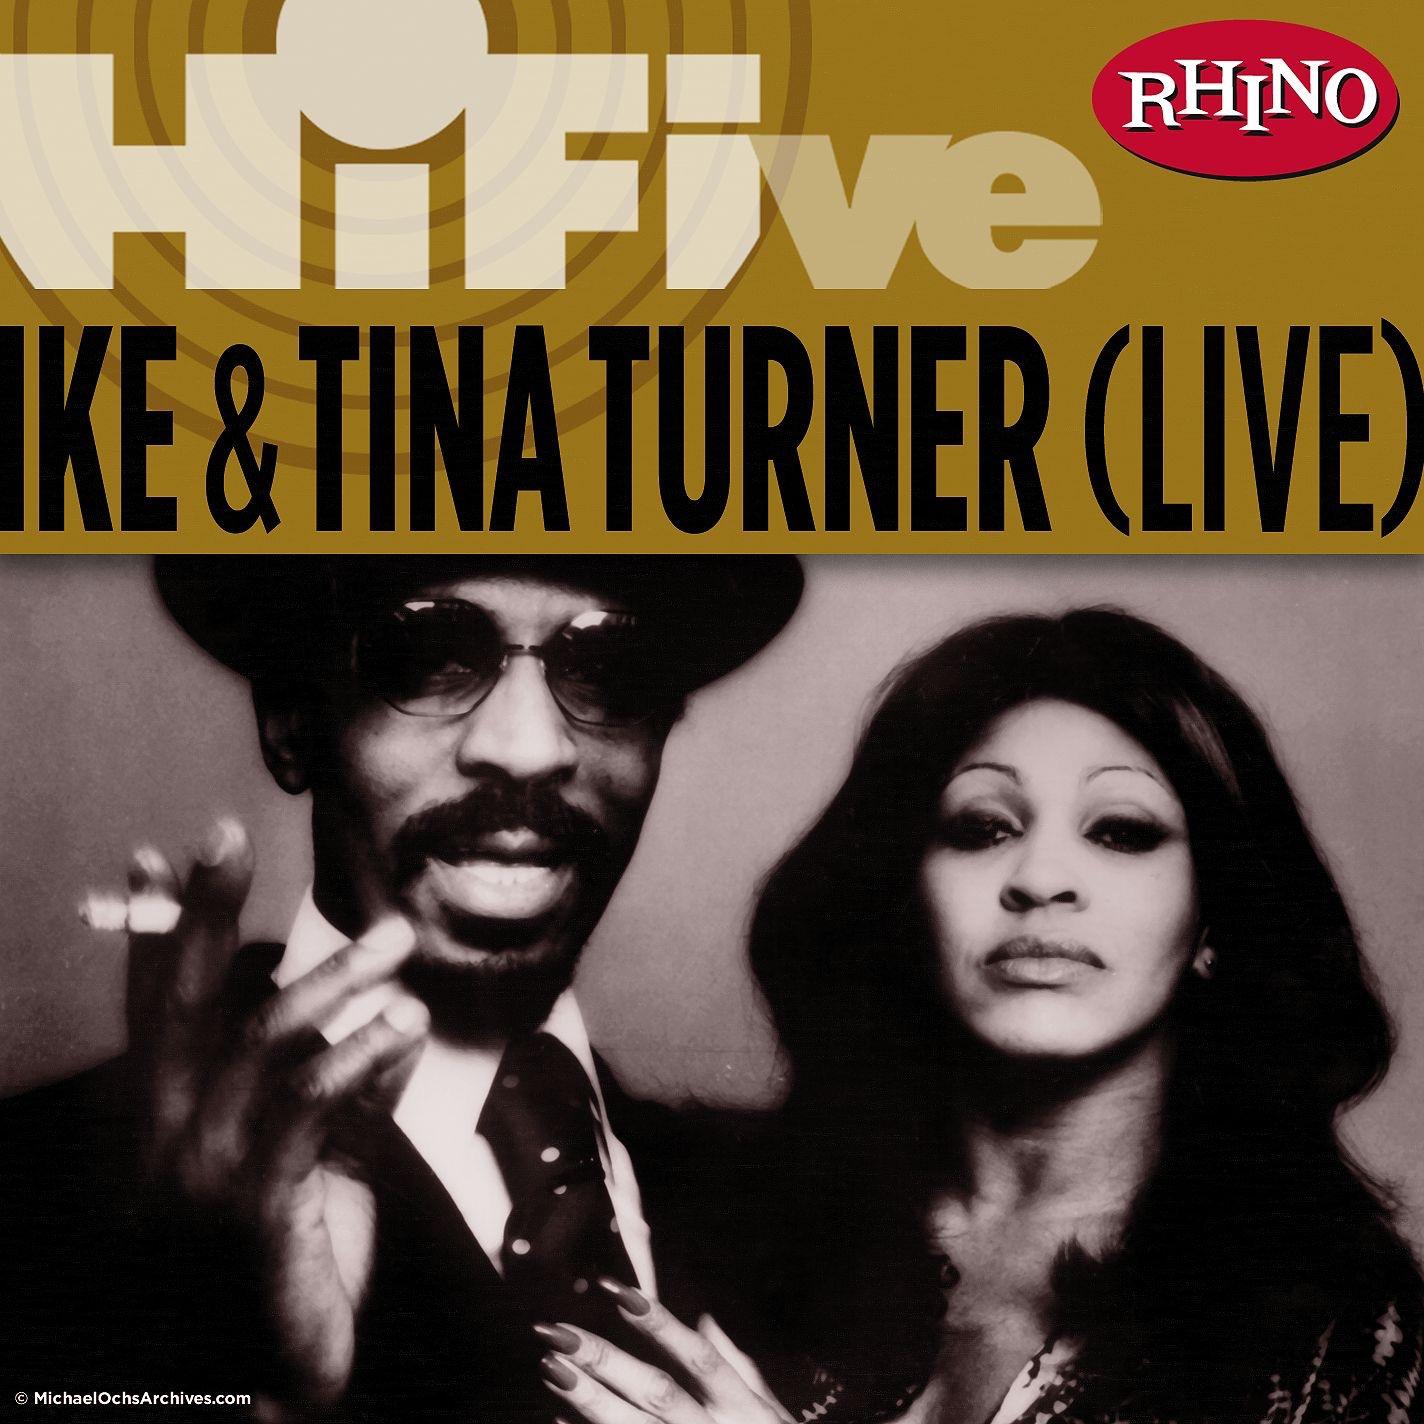 Rhino Hi-Five: Ike & Tina Turner (Live) - EP